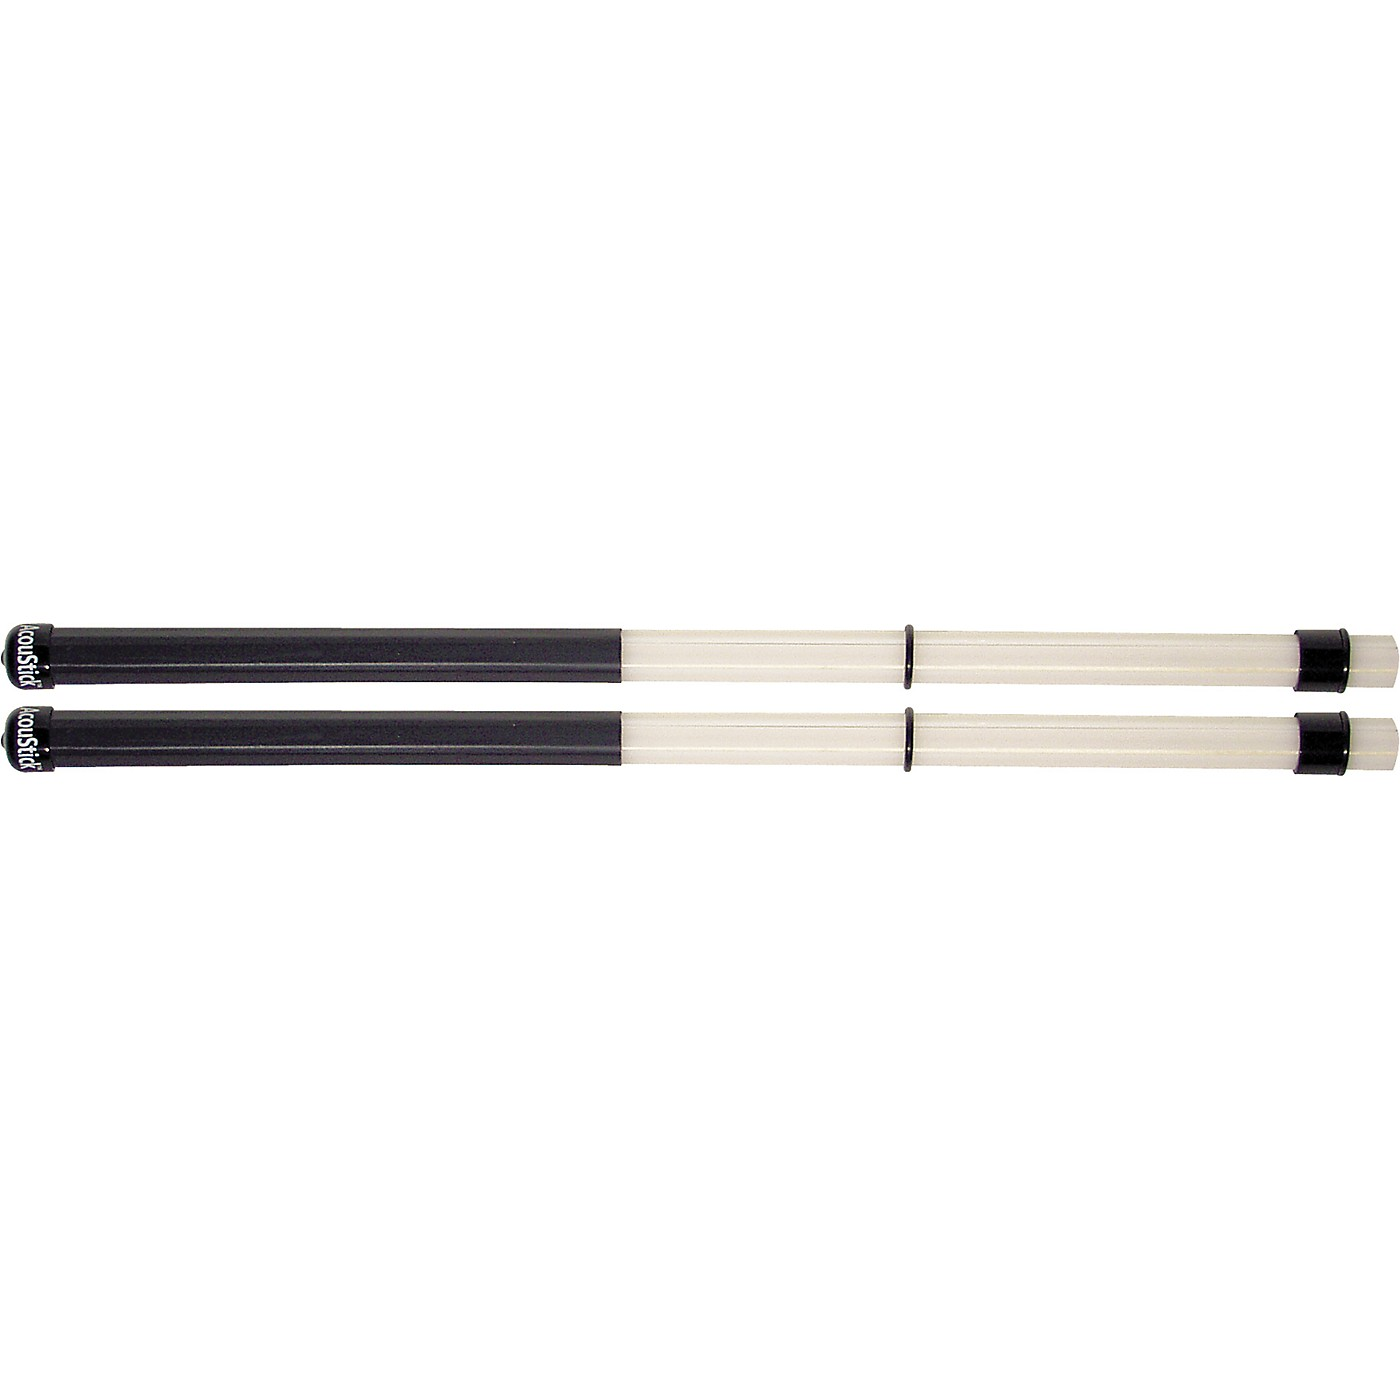 Vater Acoustick Sticks thumbnail